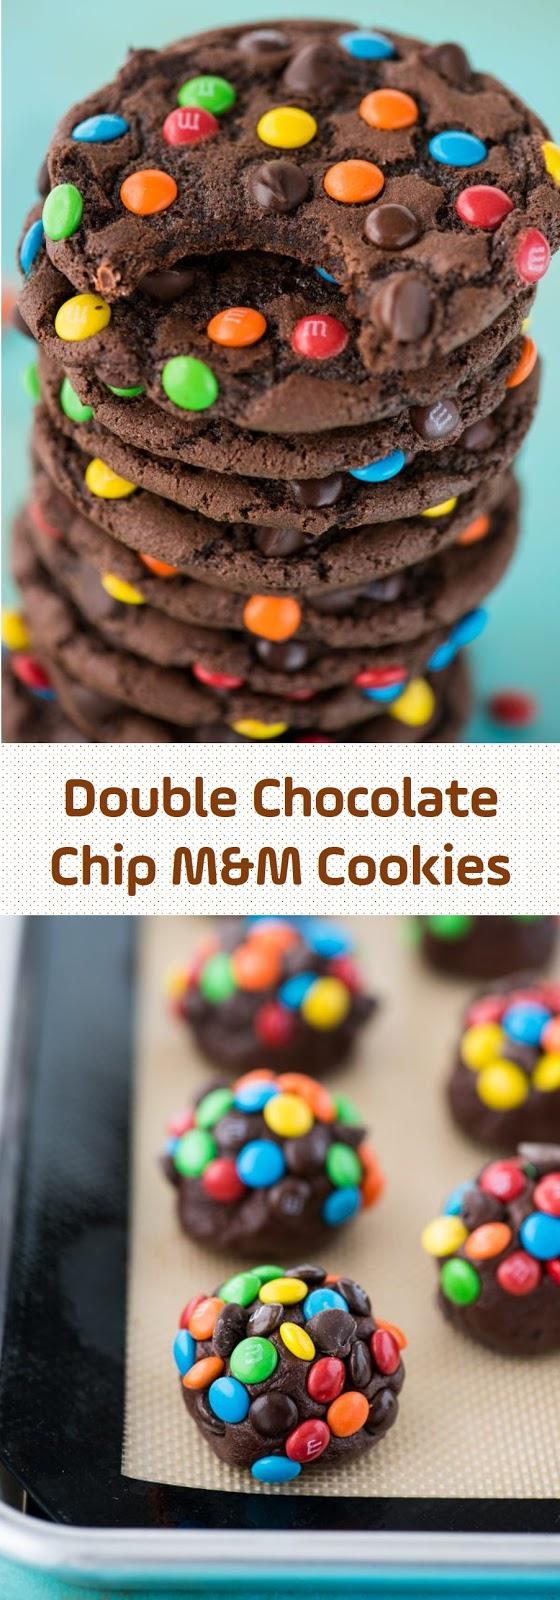 Photo of Doble Chocolate Chip M&M Cookies #chocolatechip #mandm